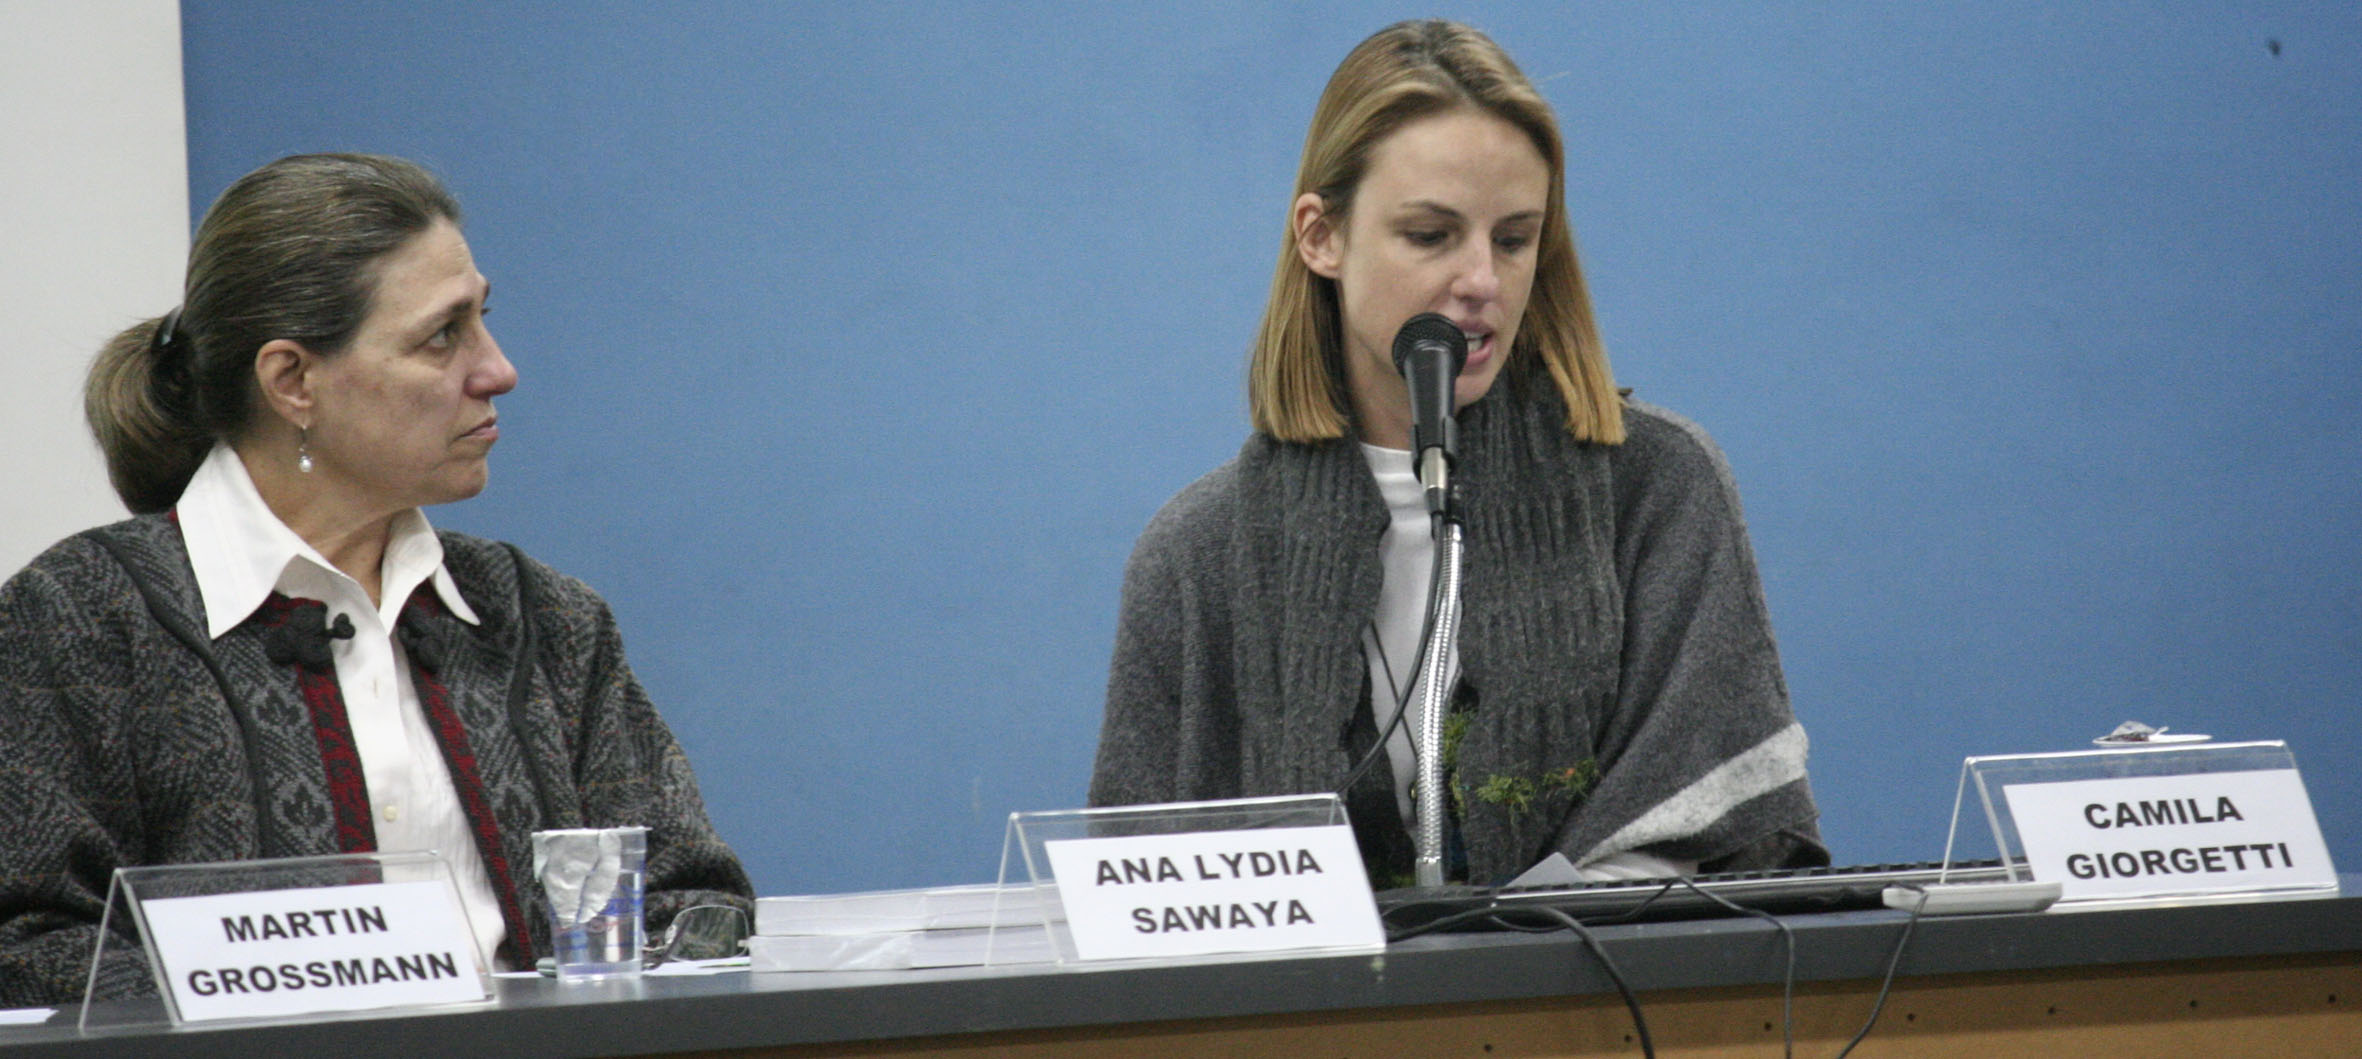 Ana Lydia Sawaya e Camila Giorgetti